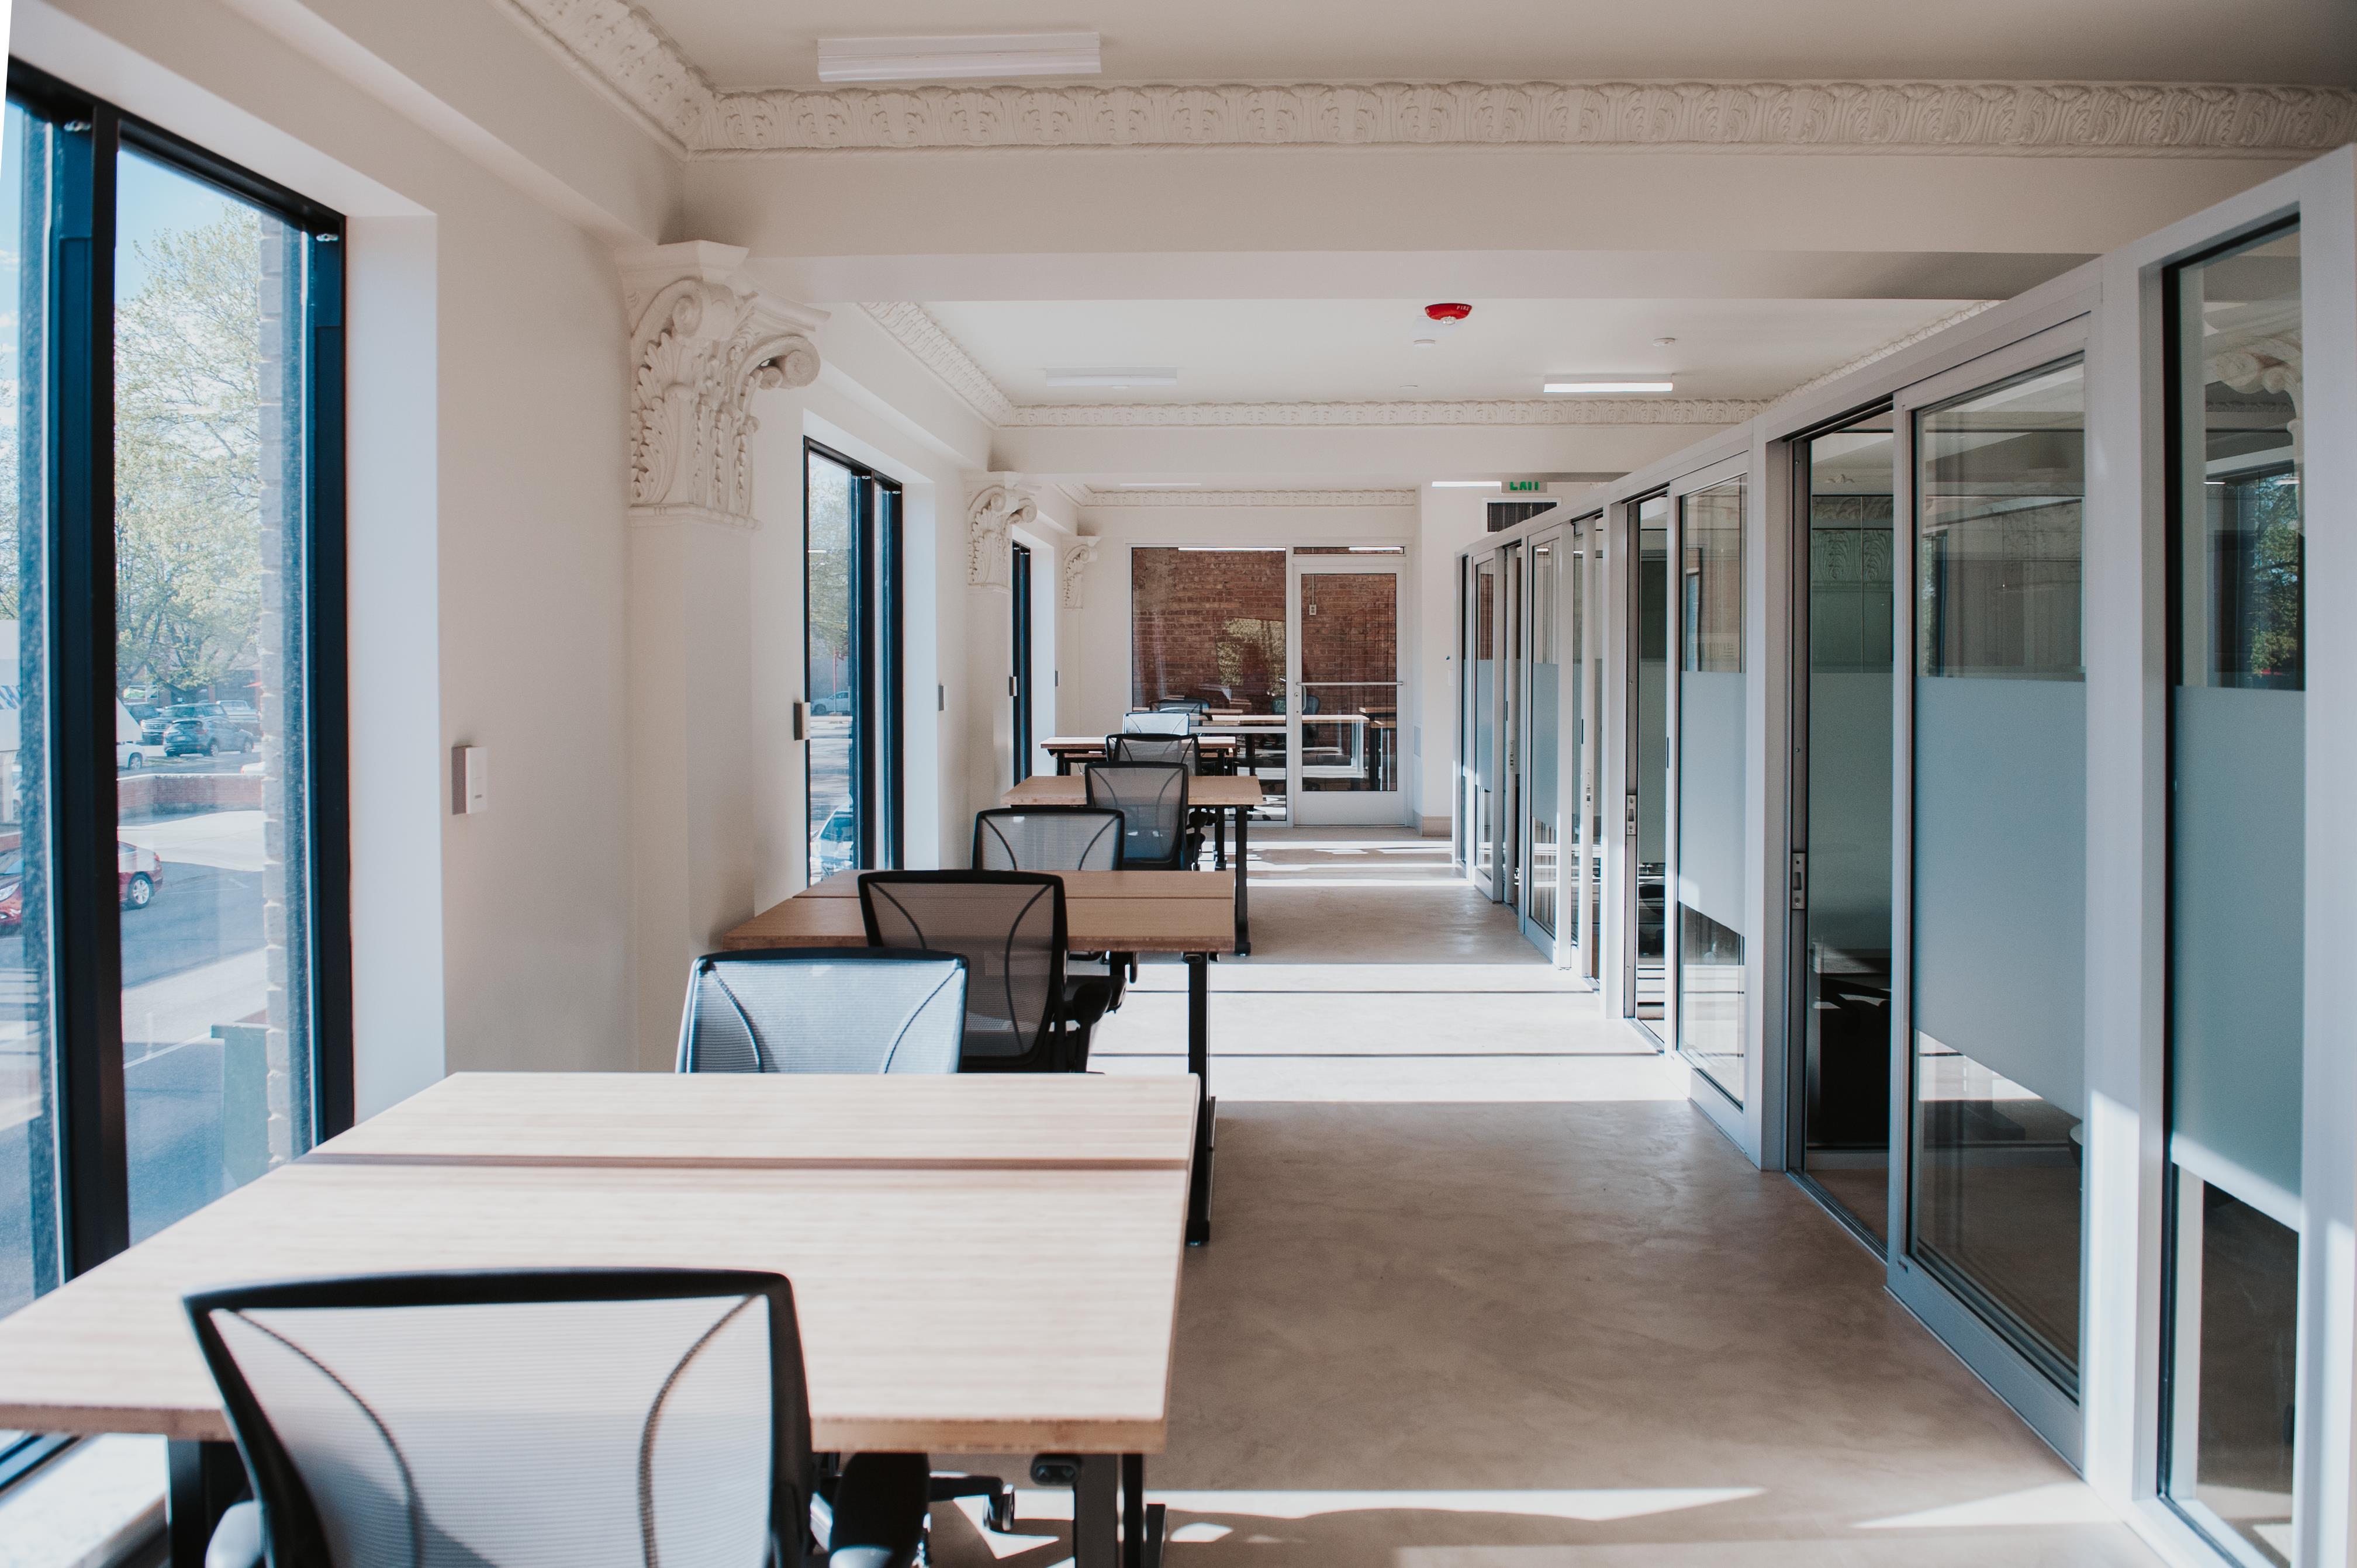 Loveland Office Space